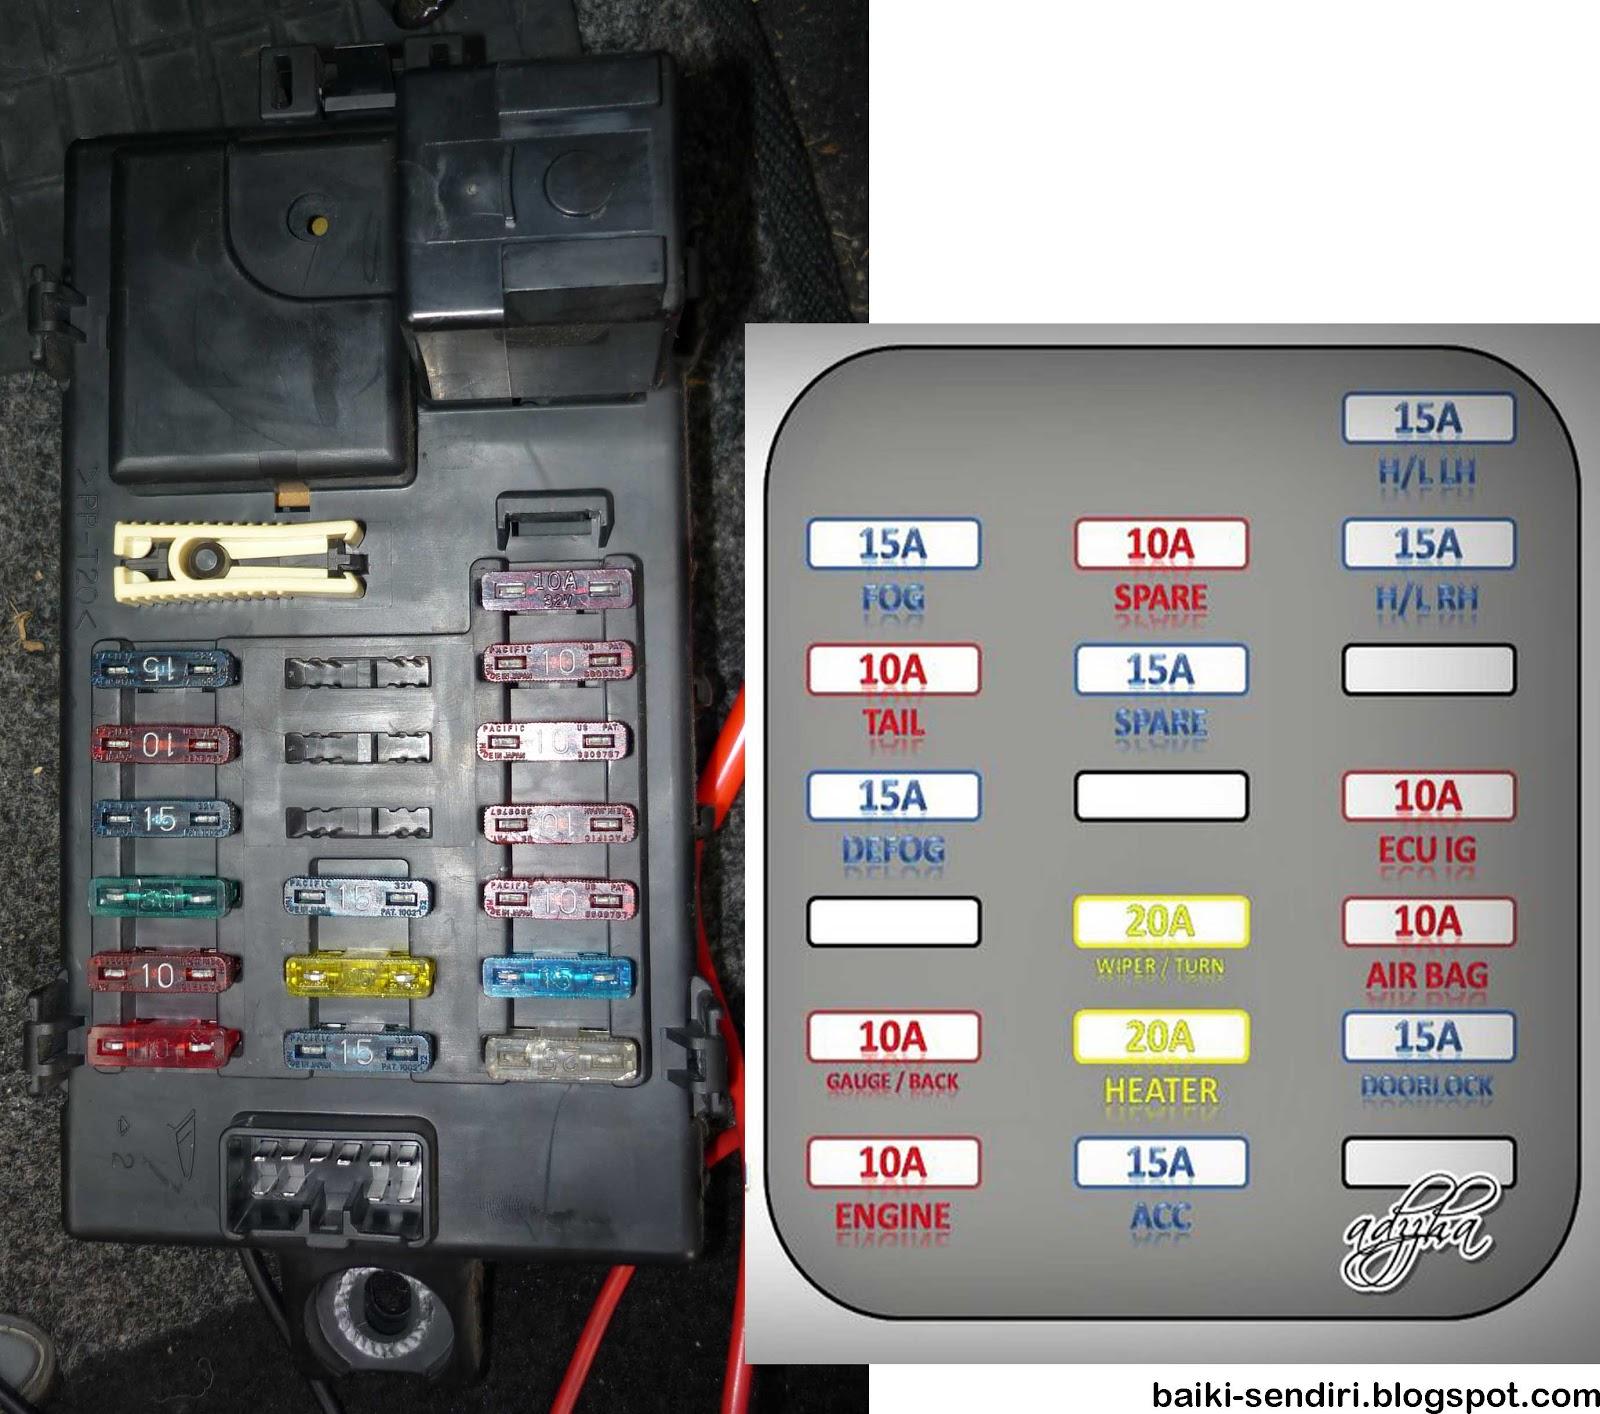 04D23 Daihatsu Sirion Fuse Box Location | Wiring Resources on